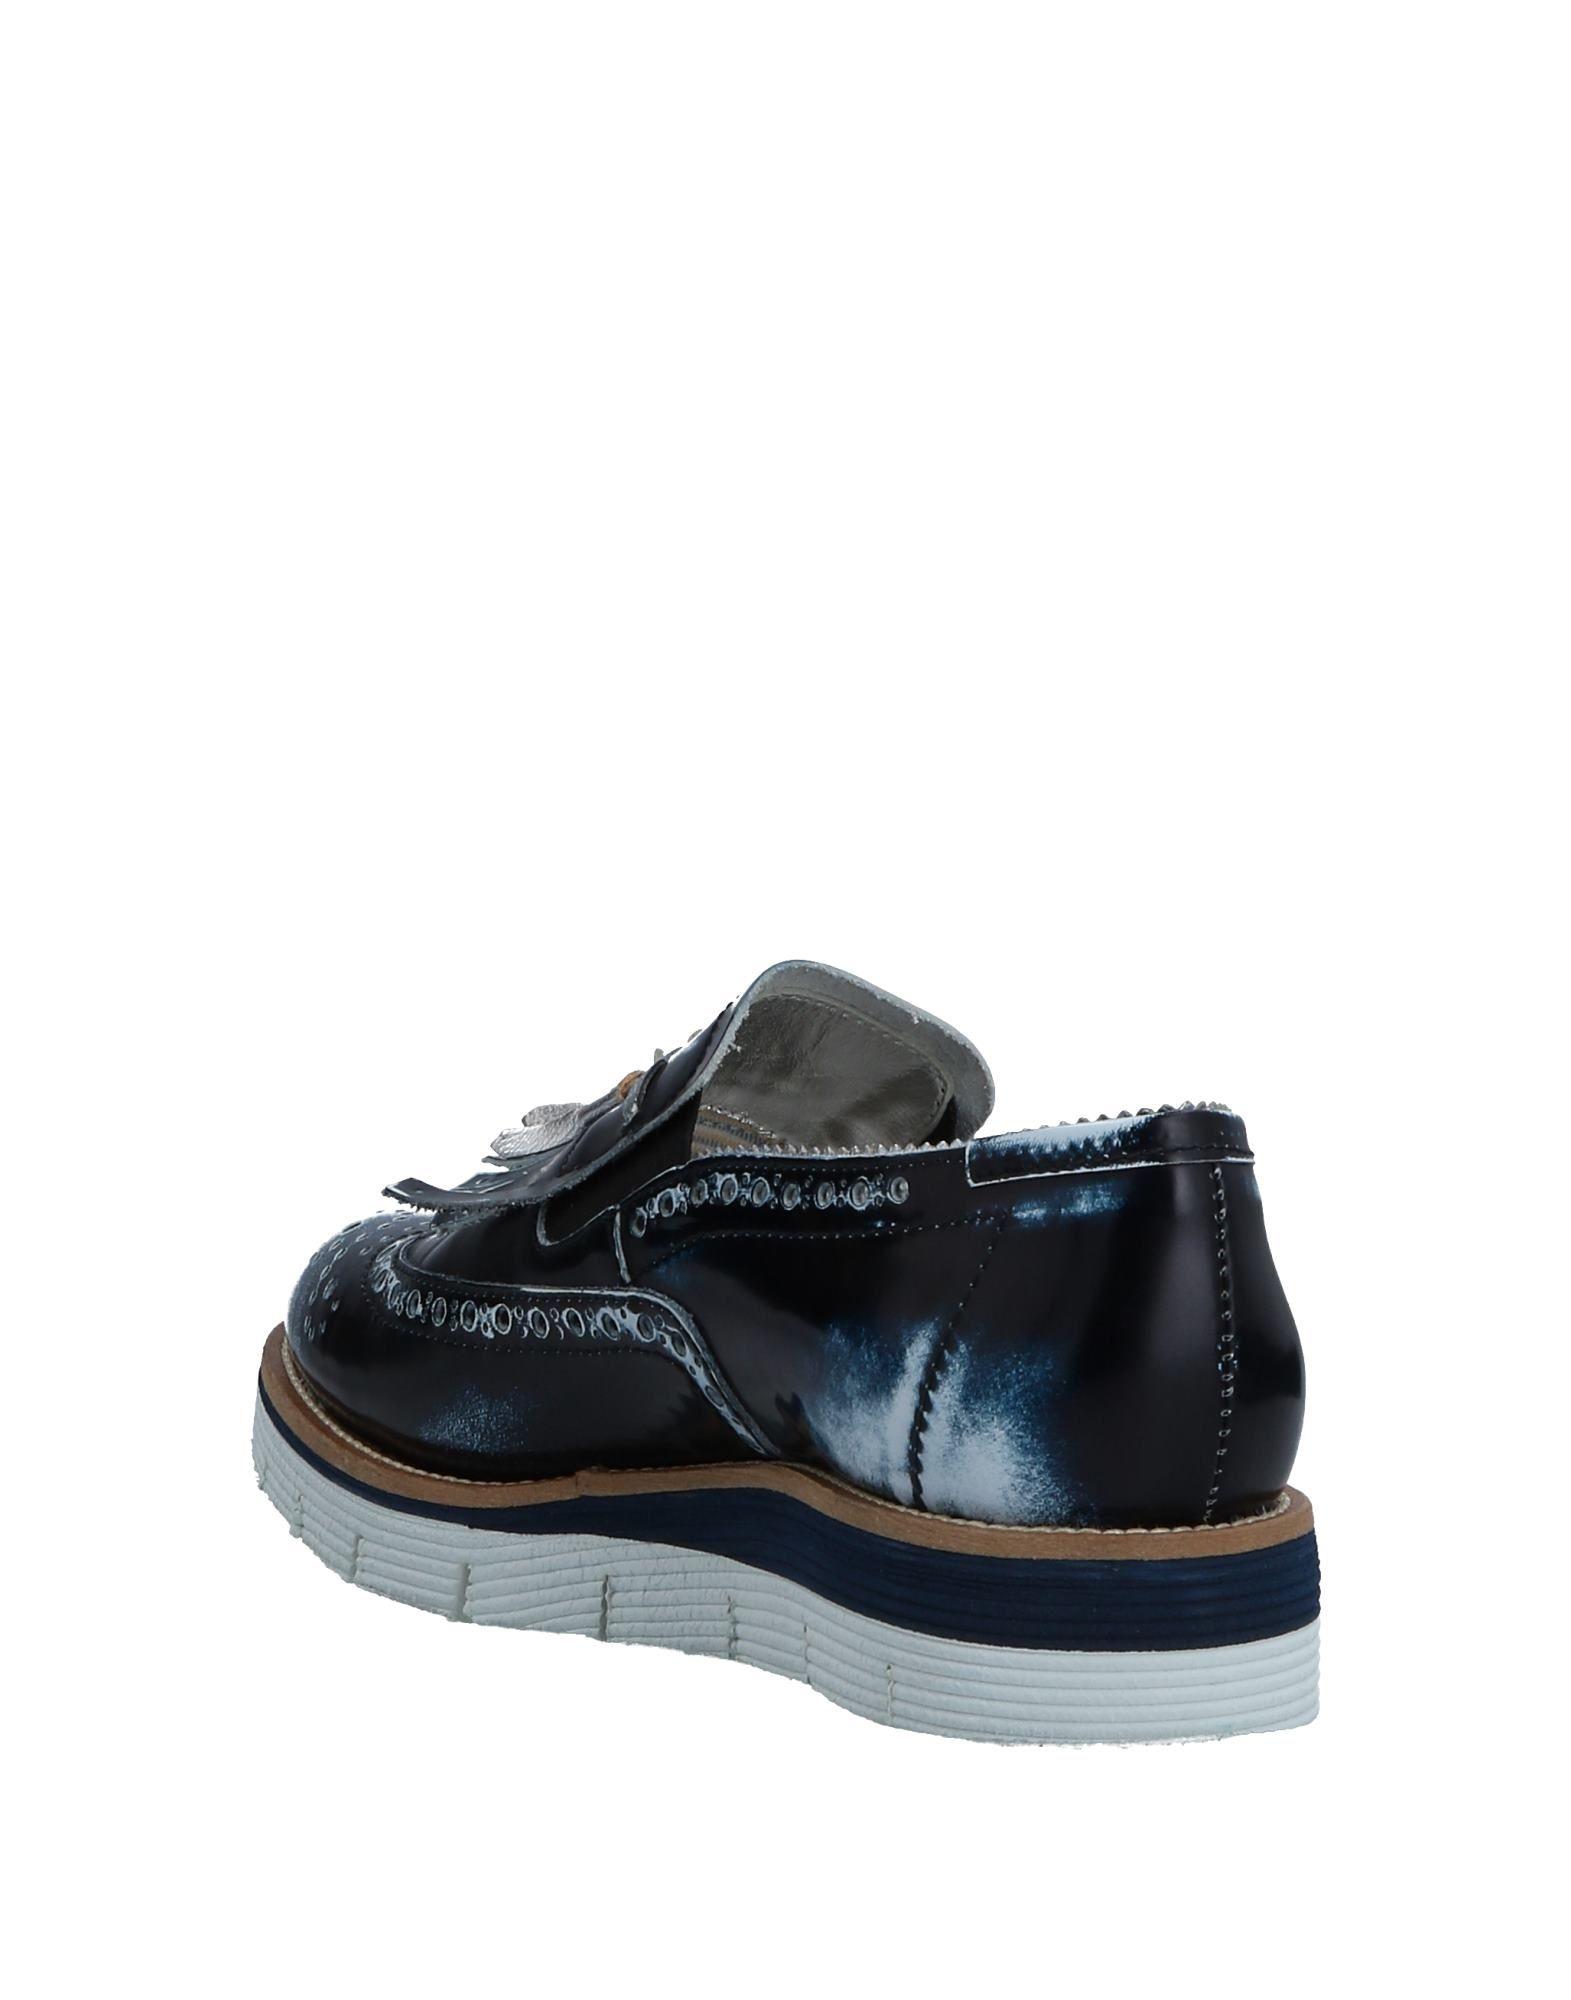 Rabatt echte Schuhe G.A.S.  Gruppo Artigiano Scarpe Mokassins Herren  G.A.S. 11531824BW b2b024